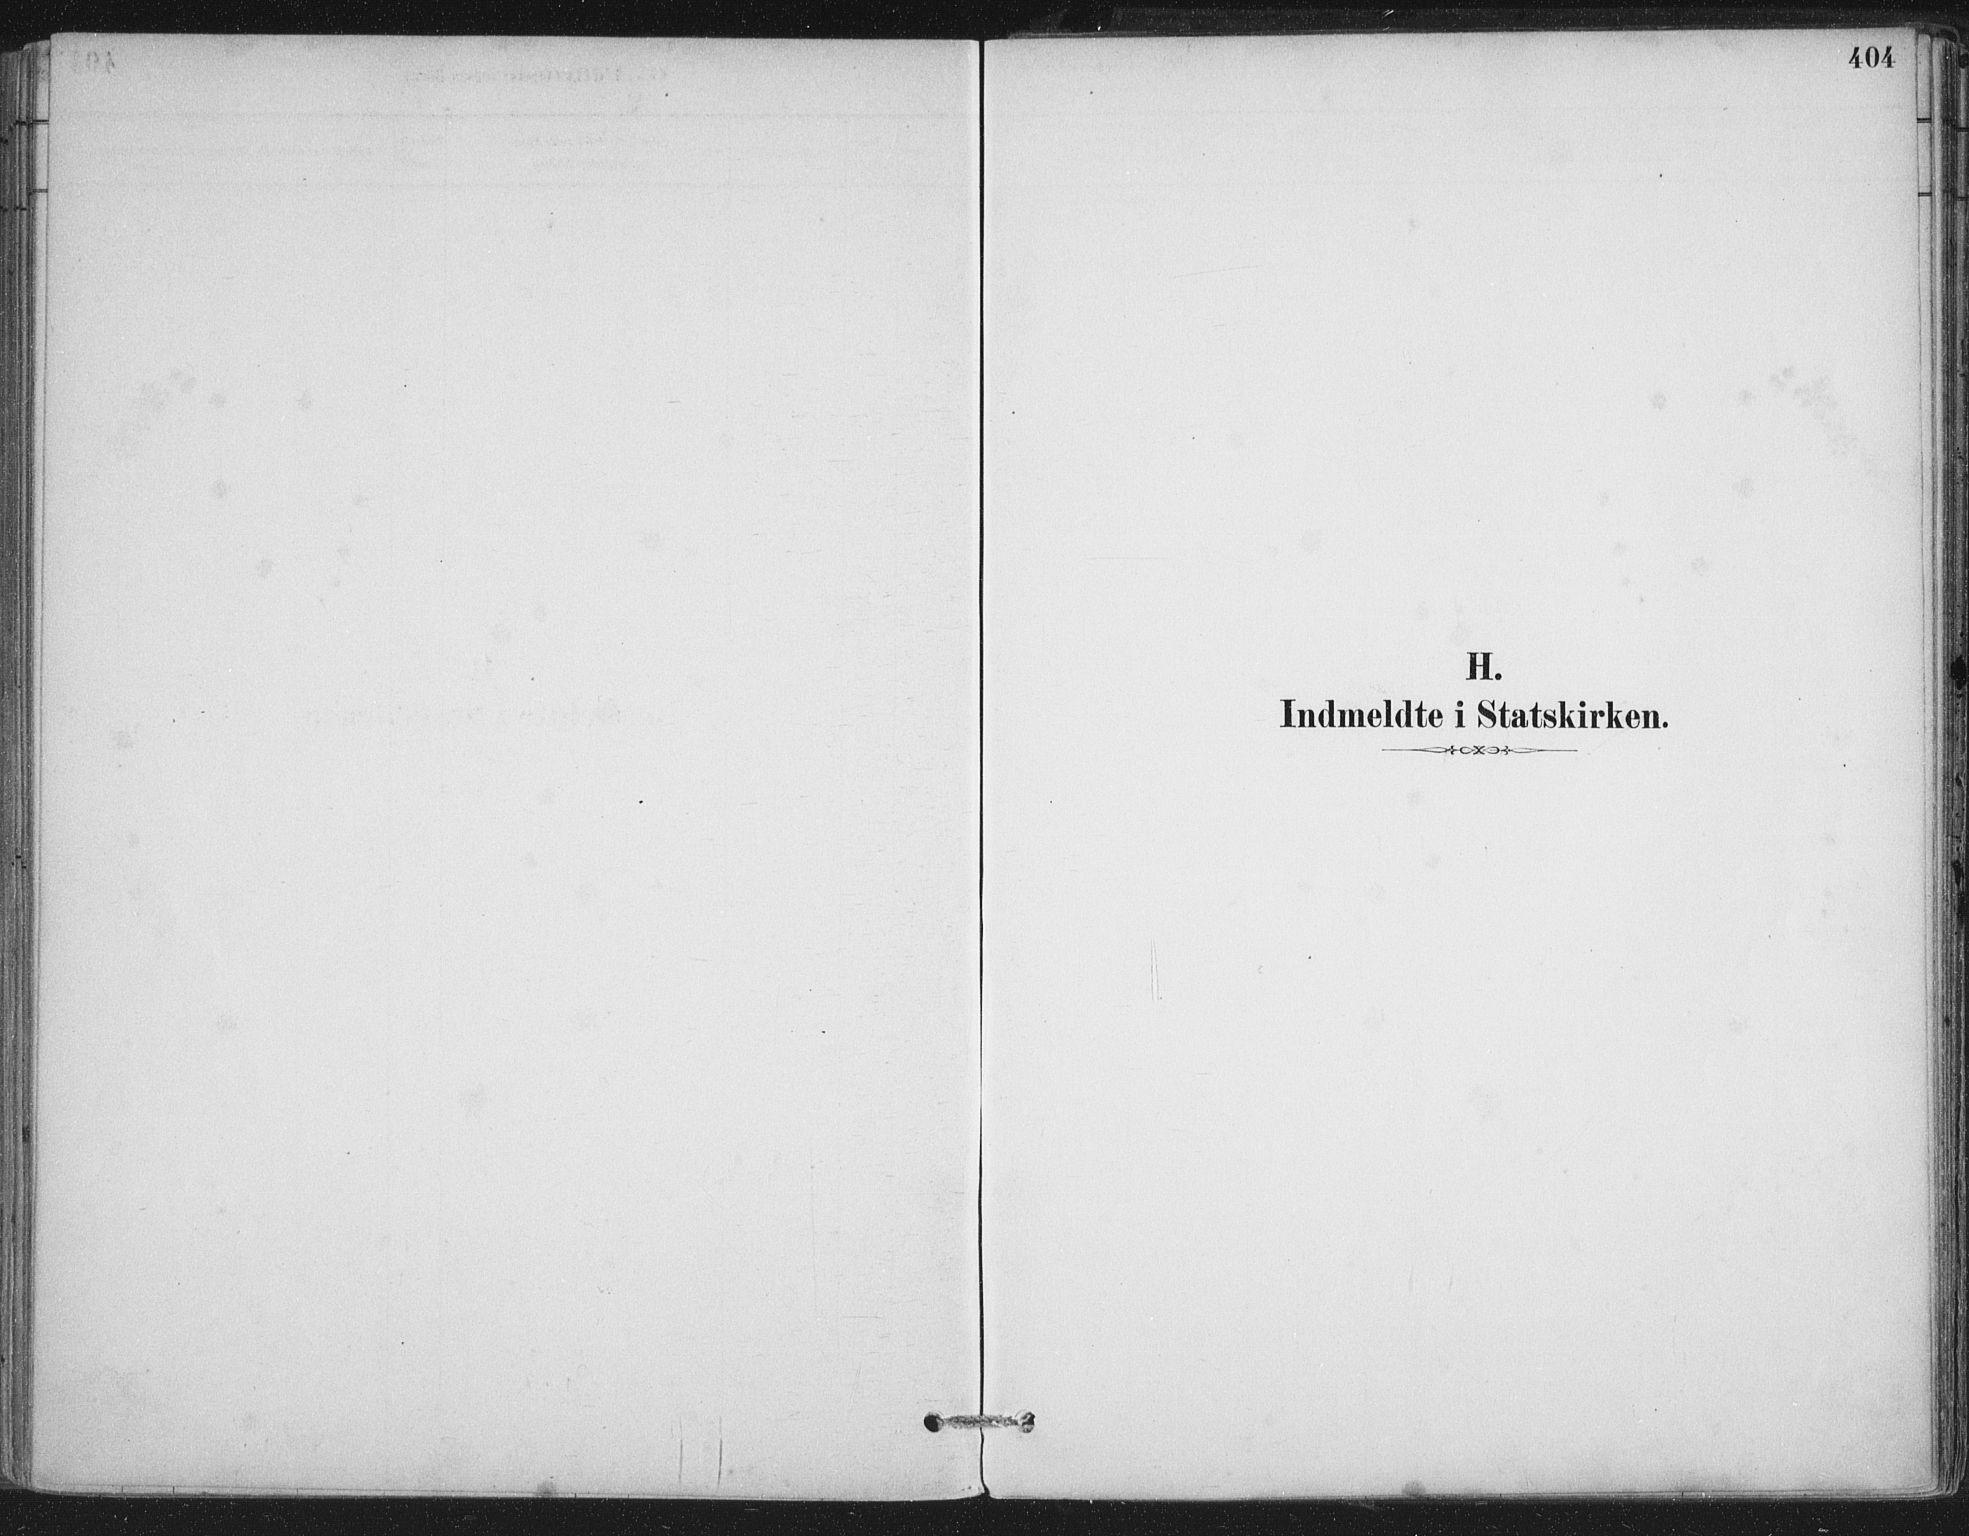 SAT, Ministerialprotokoller, klokkerbøker og fødselsregistre - Nordland, 888/L1244: Ministerialbok nr. 888A10, 1880-1890, s. 404